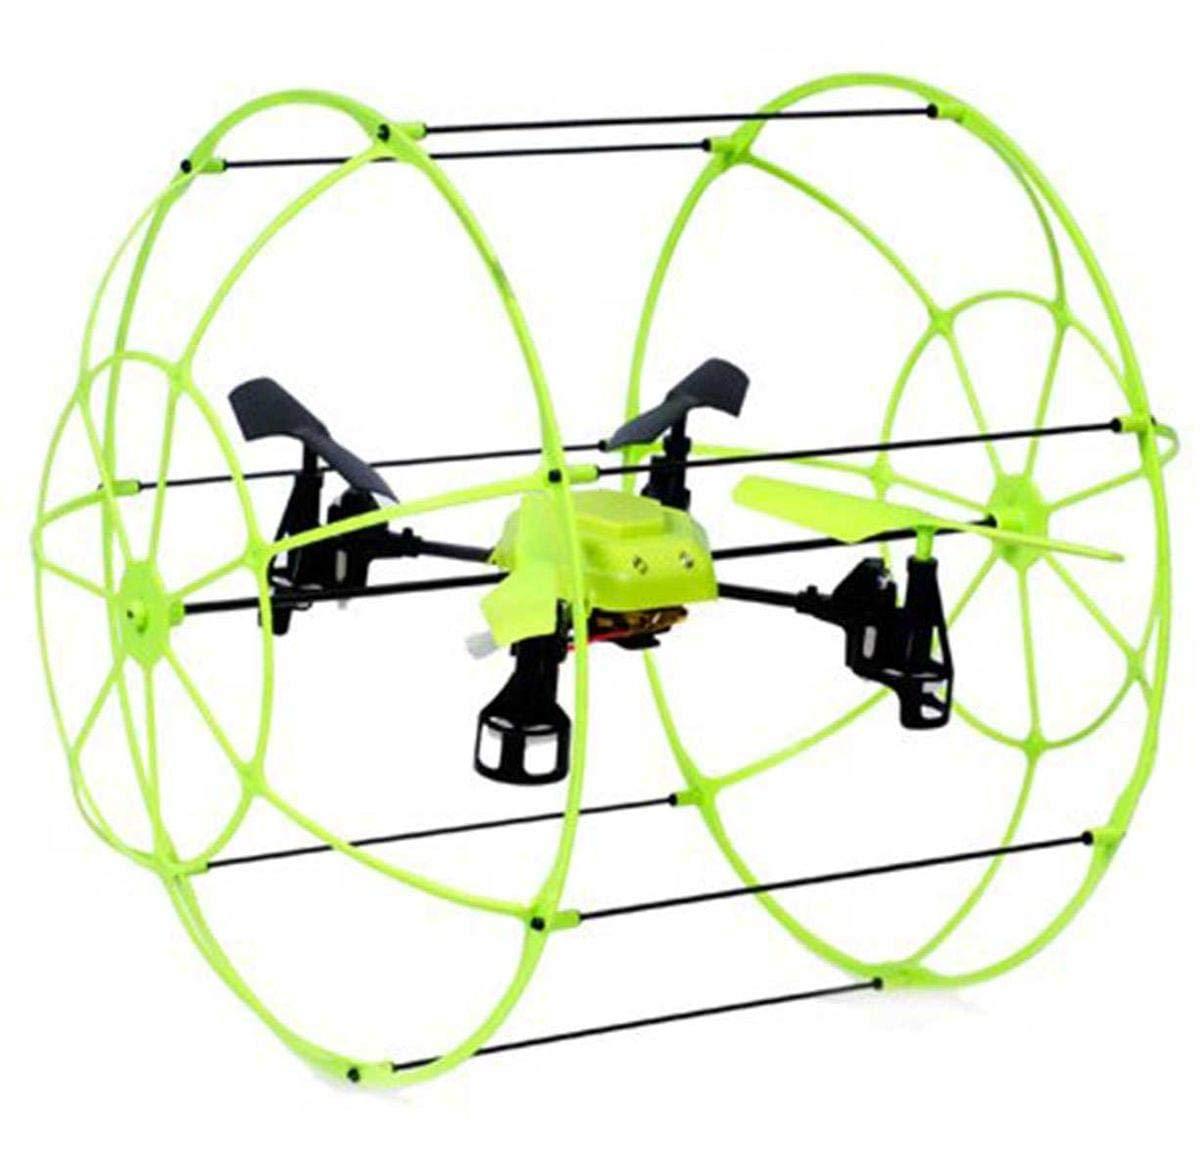 CDM product Mukikim NX1700 Sky Runner-Quadcopter Aerocraft, 2.4 GHz Caged Drone big image